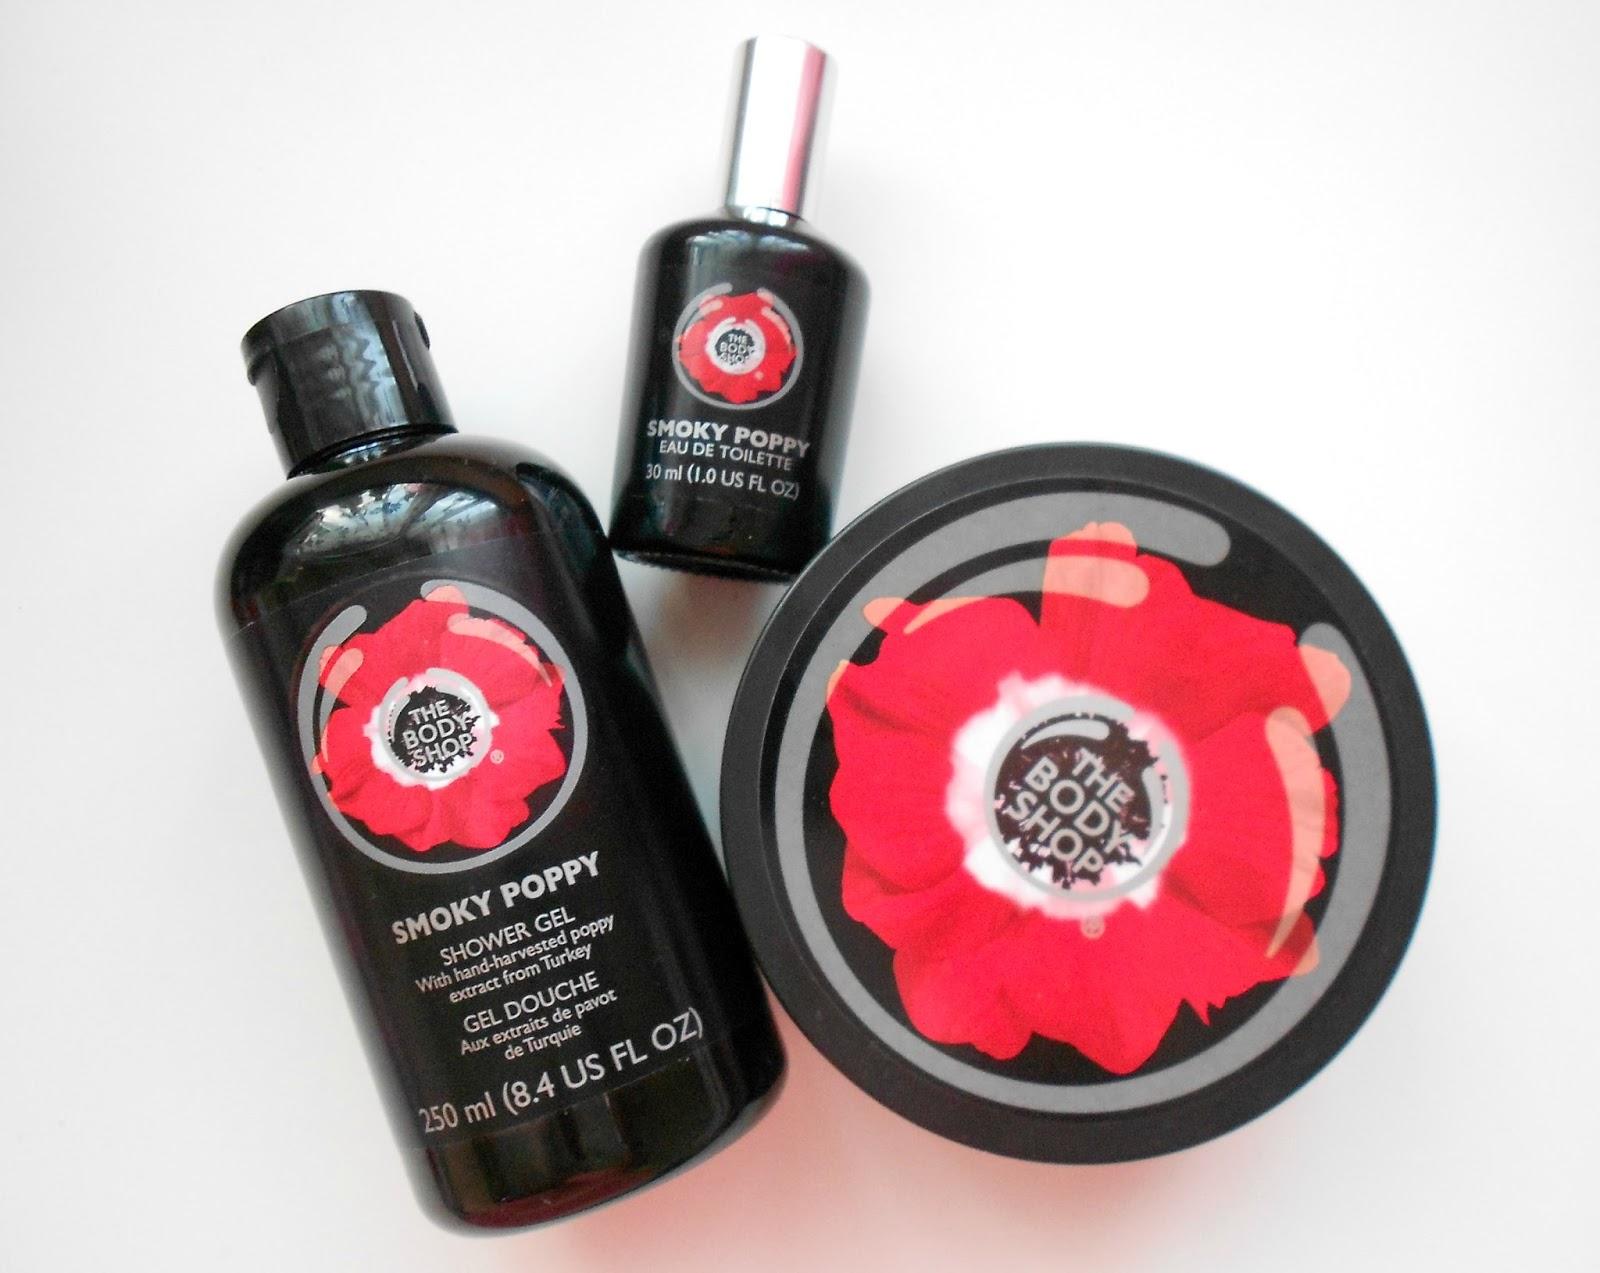 smoky poppy body shop showergel butter perfume review